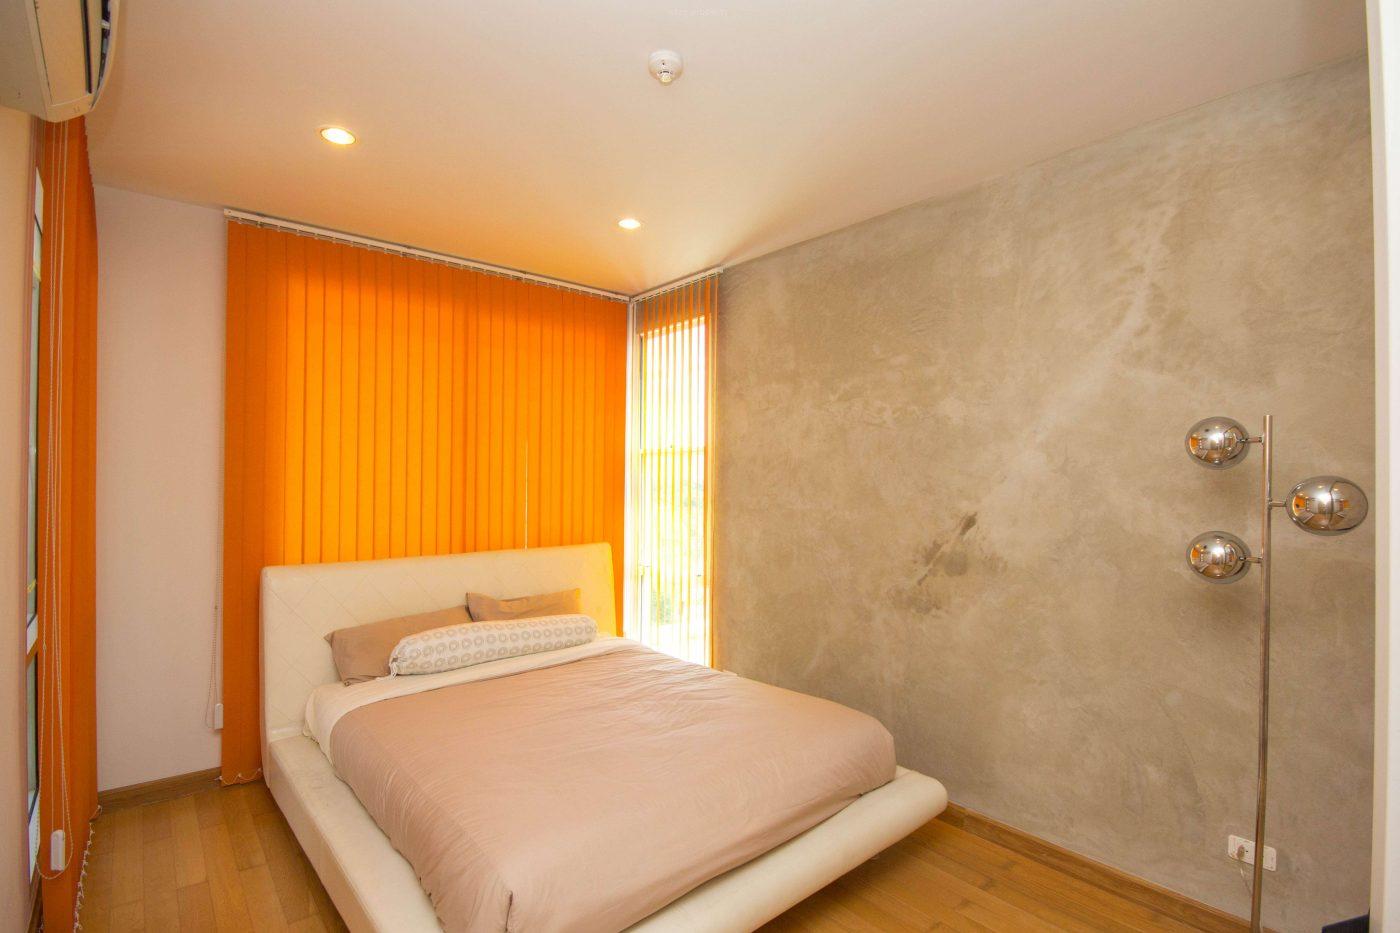 1 bedroom Villa near town for sale